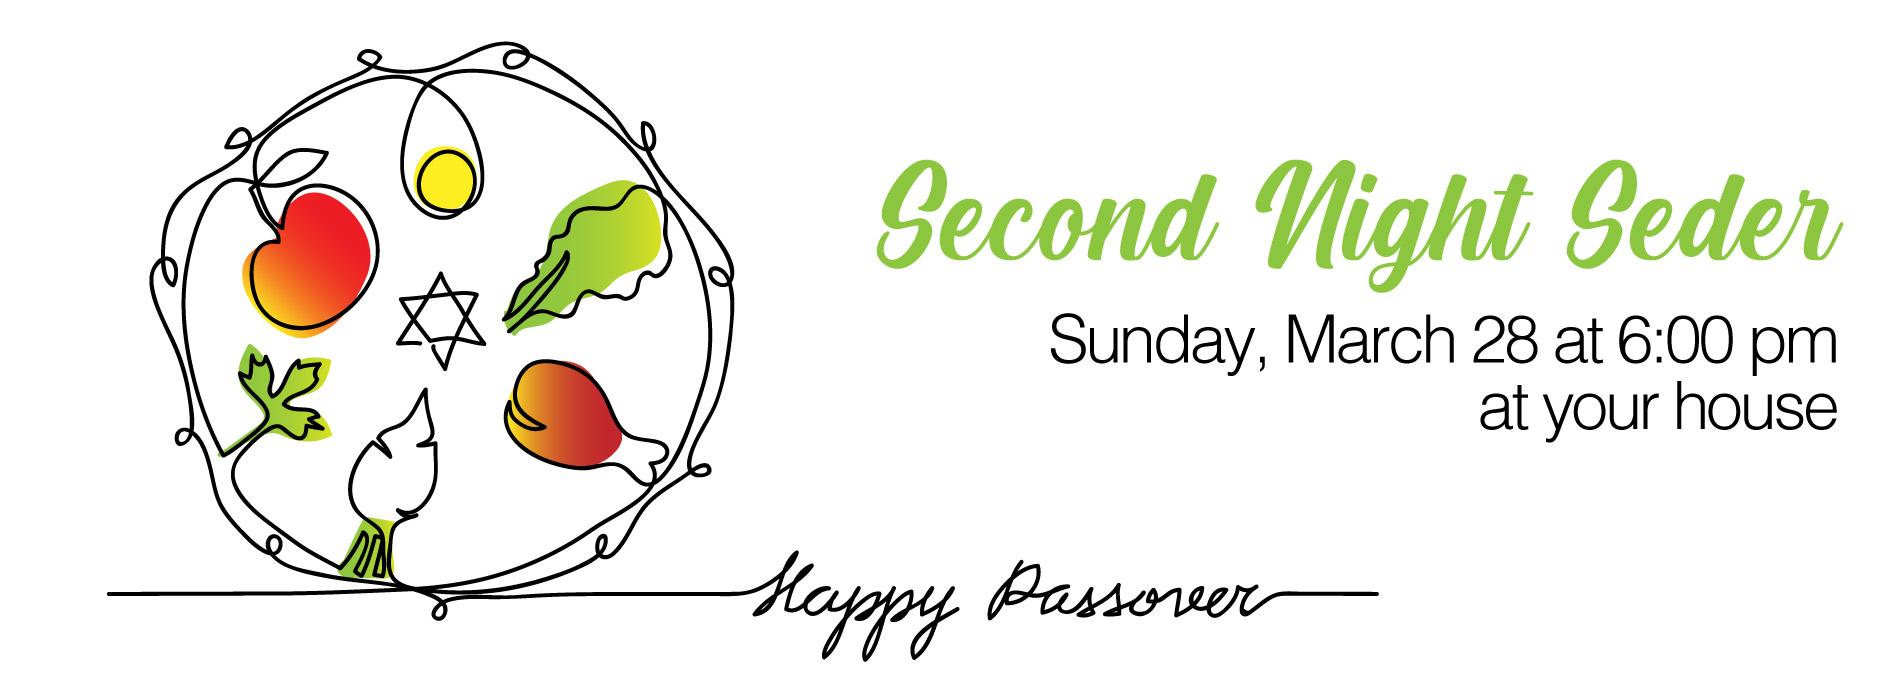 Seder page header